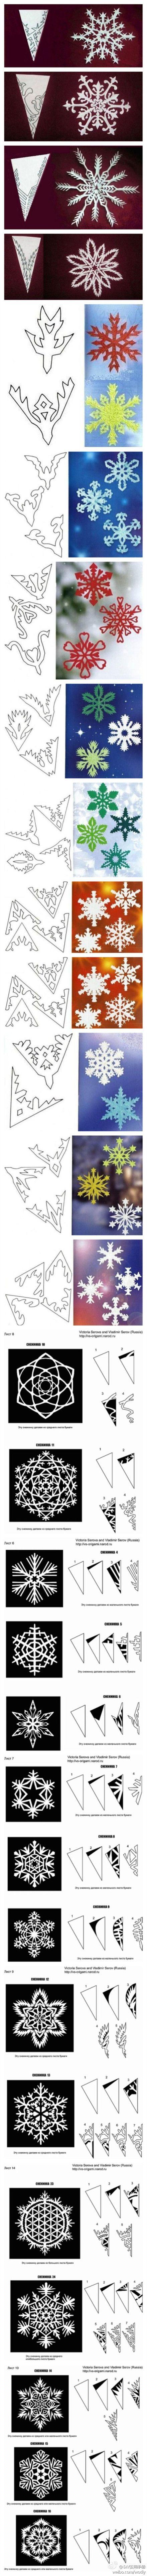 Snowflake paper cutting :)